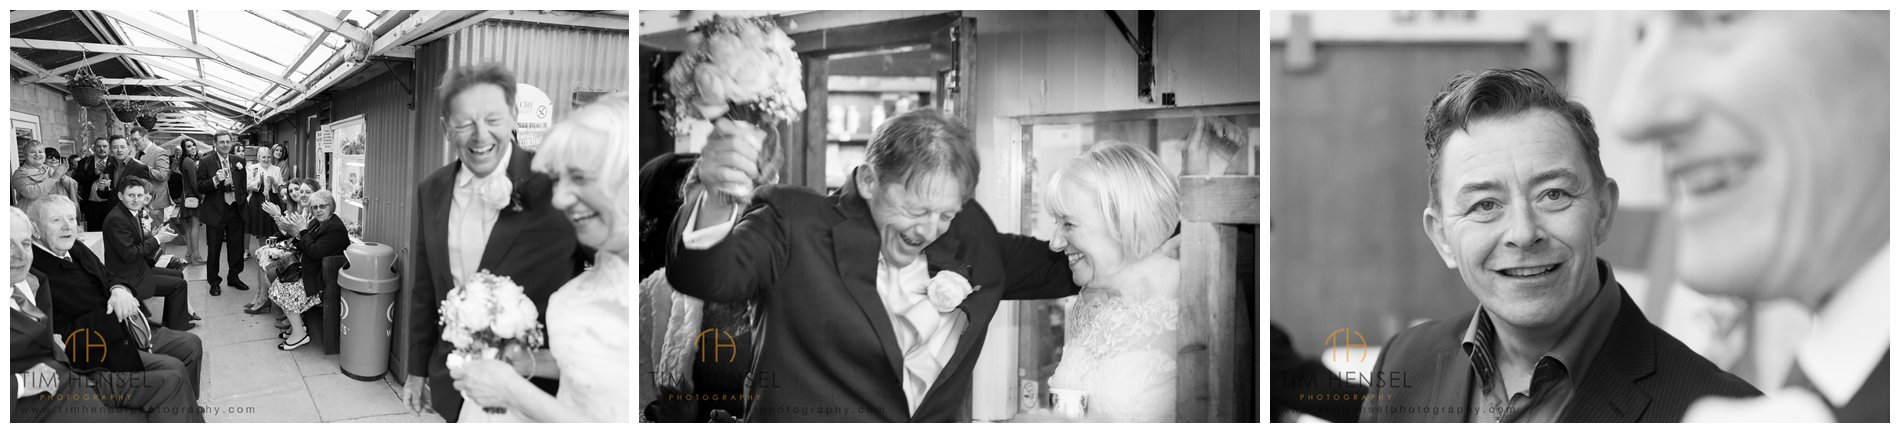 A wedding at Treak Cliff Cavern in Derbyshire